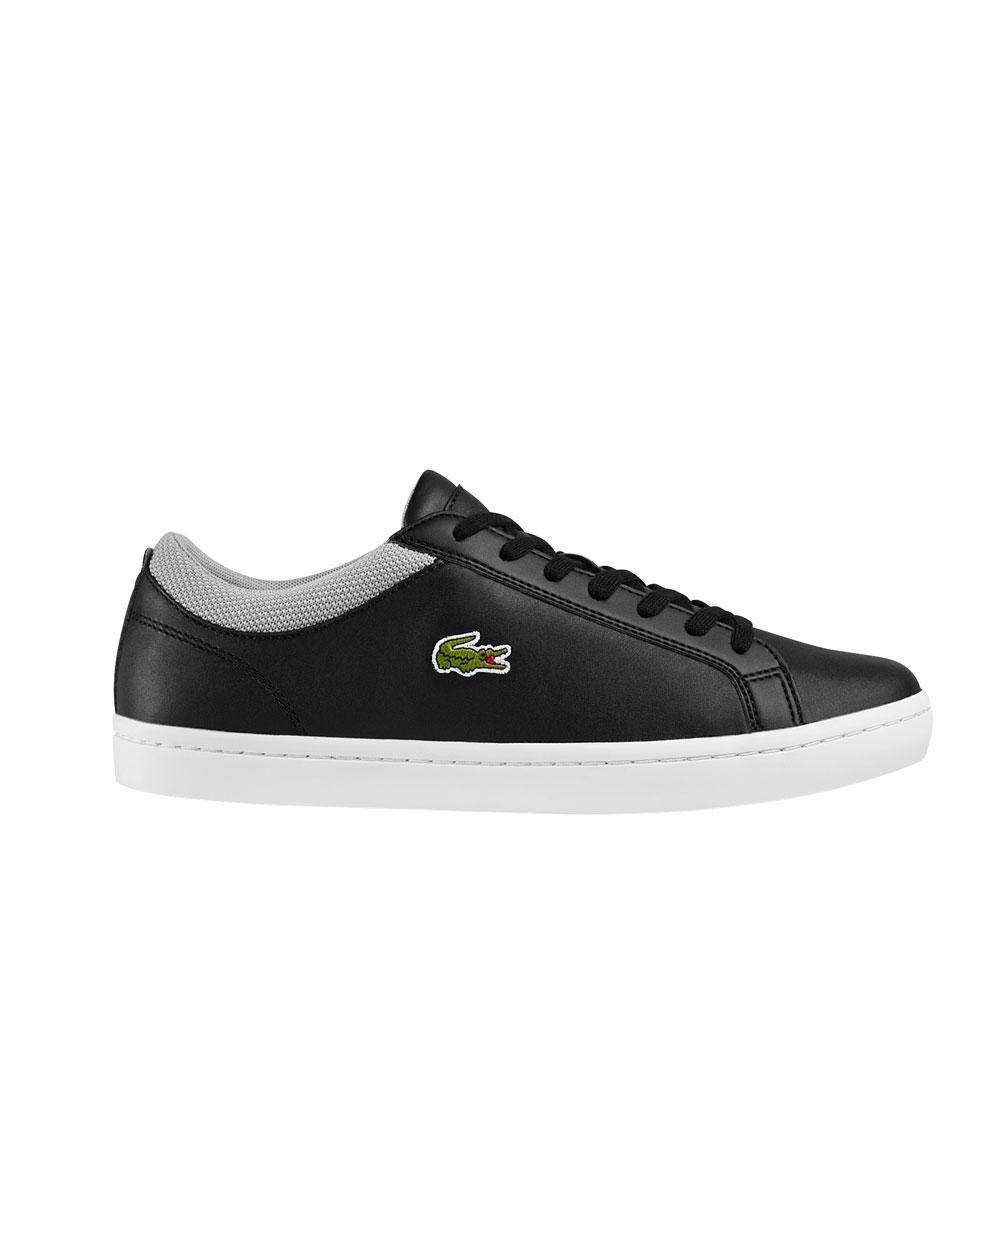 Lacoste Straightset SP 117 2 Cam (black/grey)